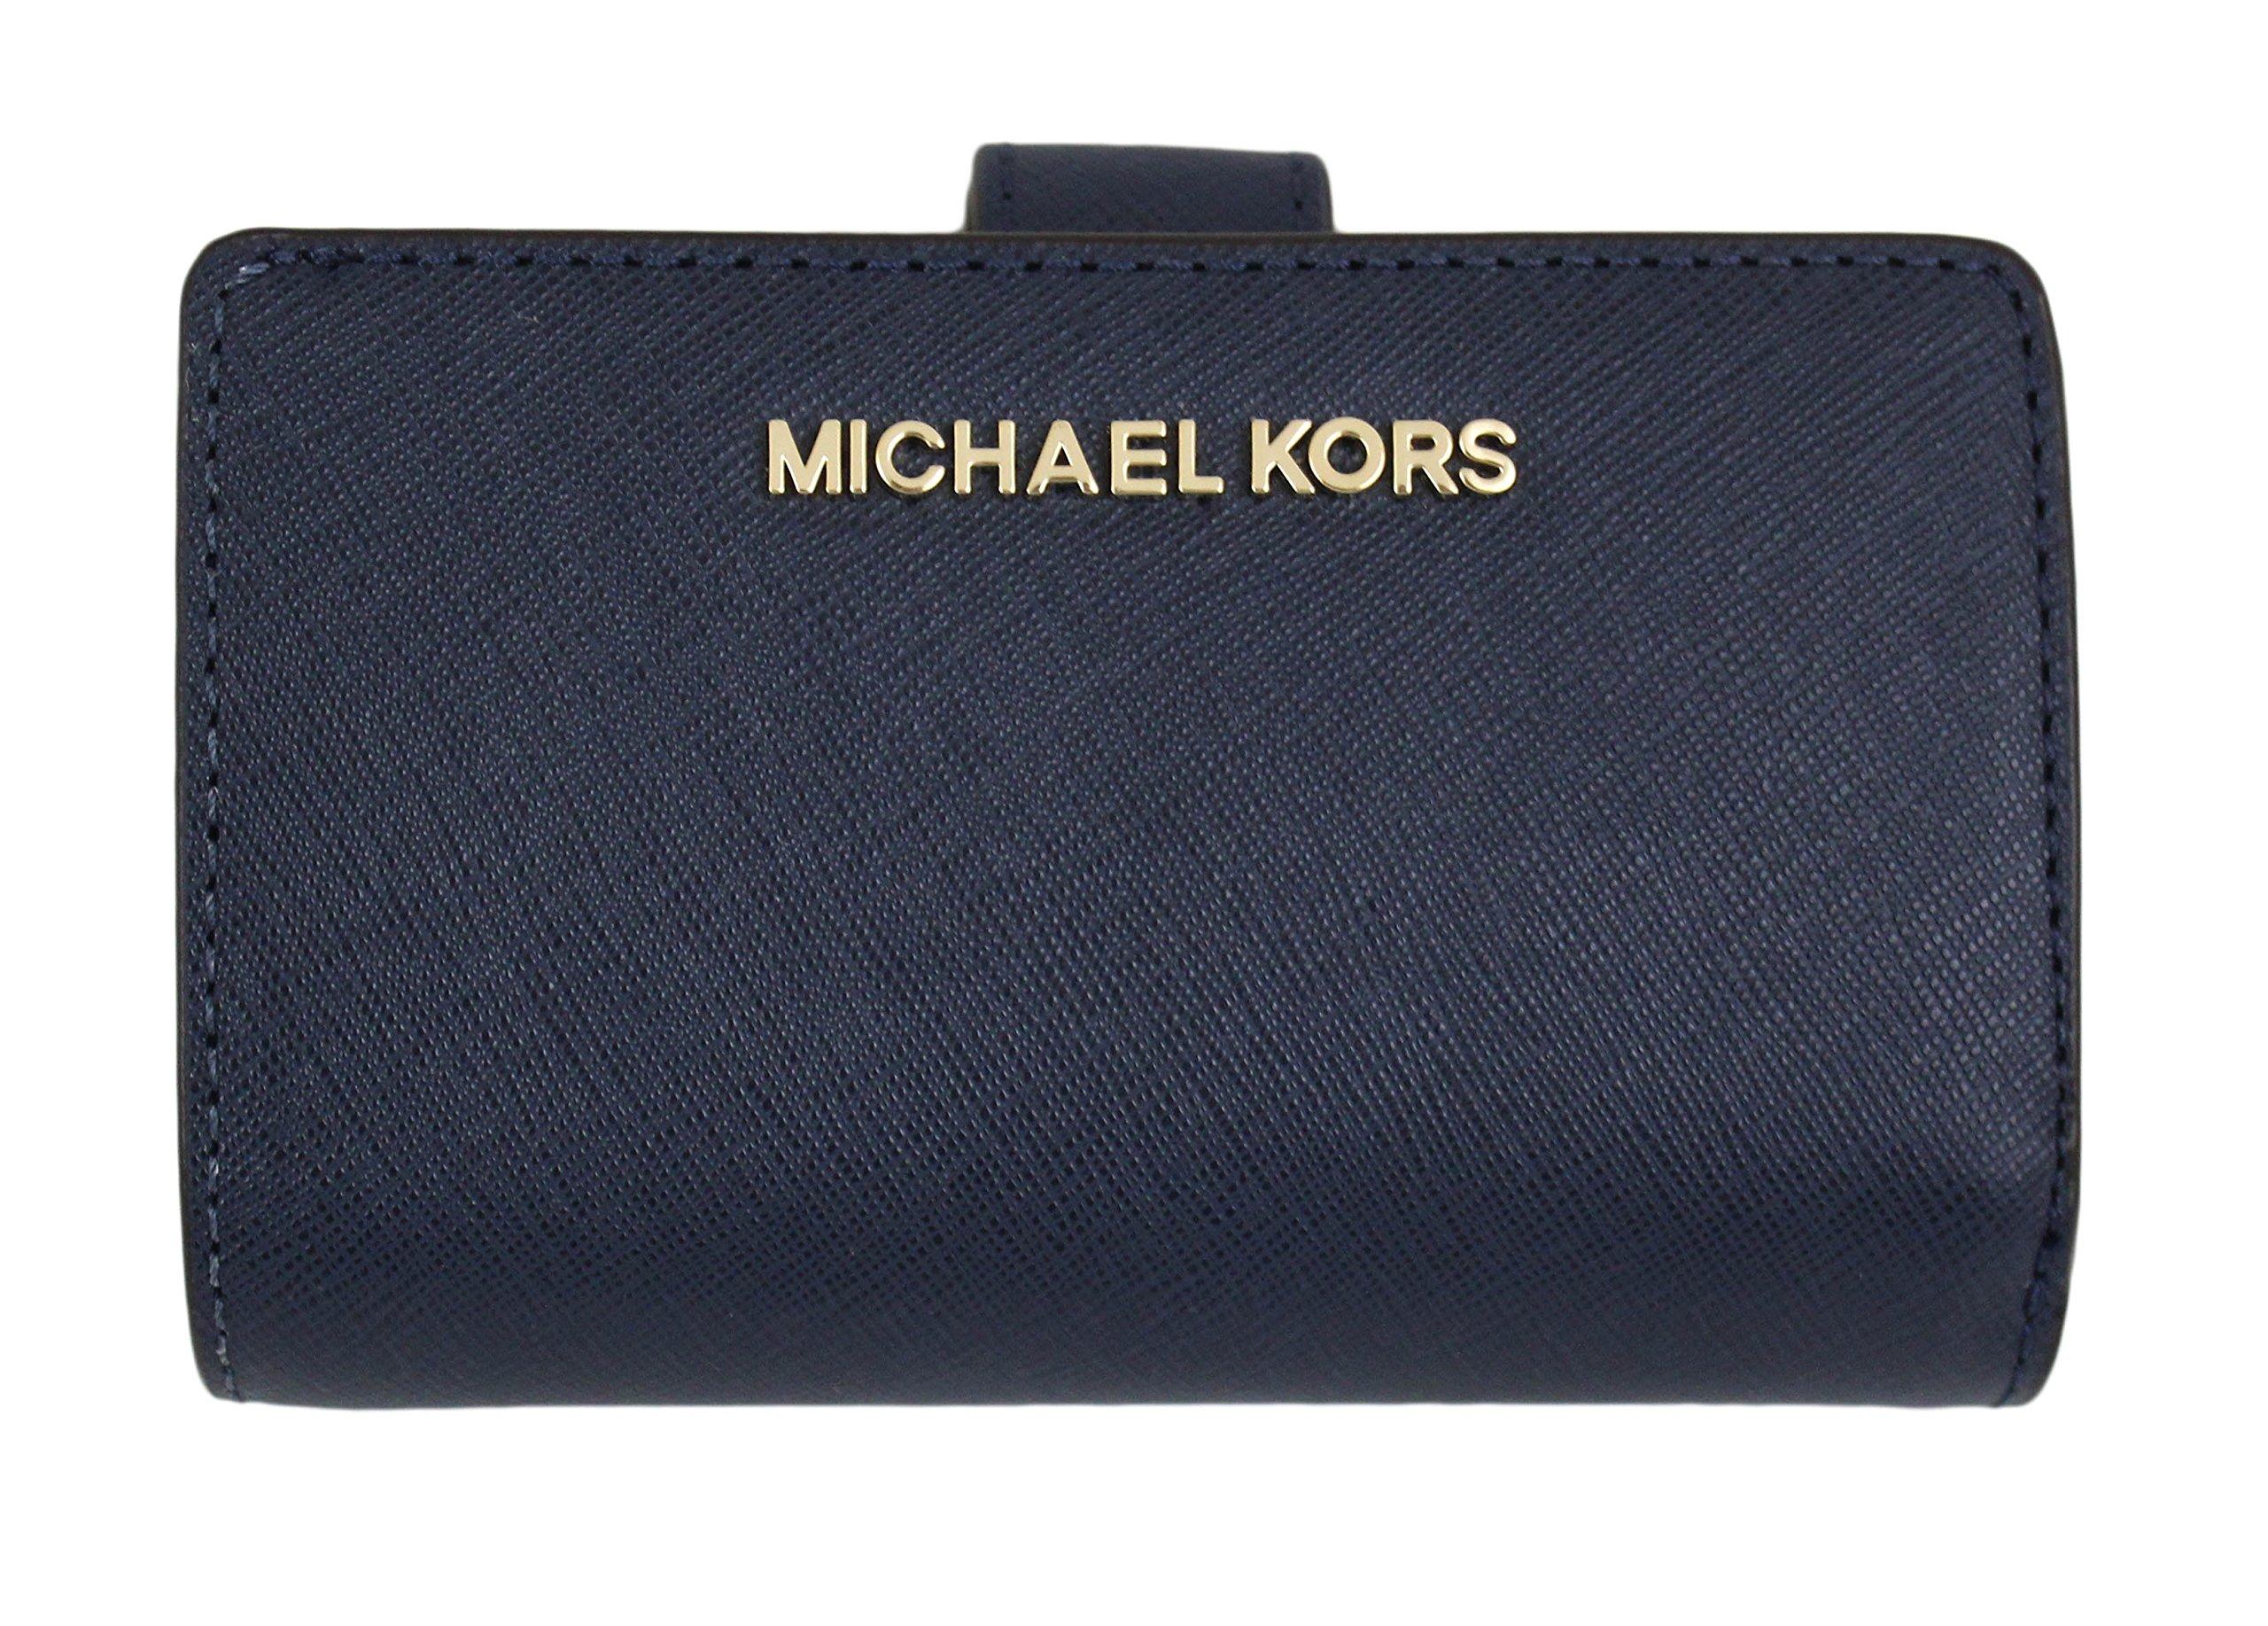 MICHAEL Michael Kors Jet Set Travel Bifold Zip Coin Wallet (Navy) by Michael Kors